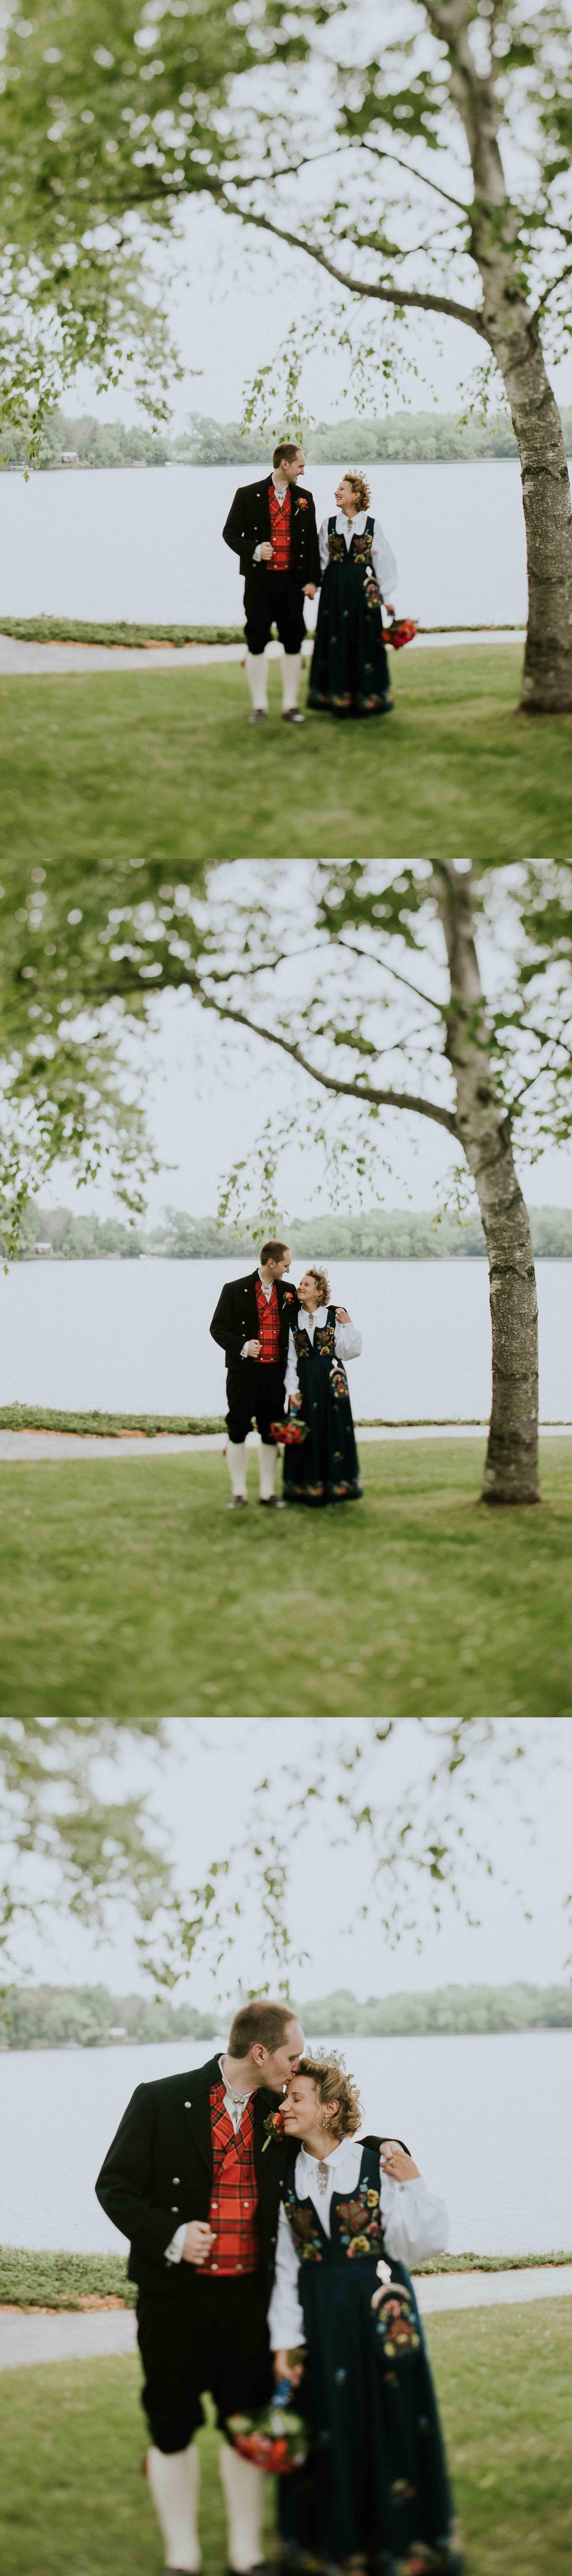 Norwegian Wedding Stevens Point Wisconsin Wedding Photographer Chloe Ann Photography_0005.jpg